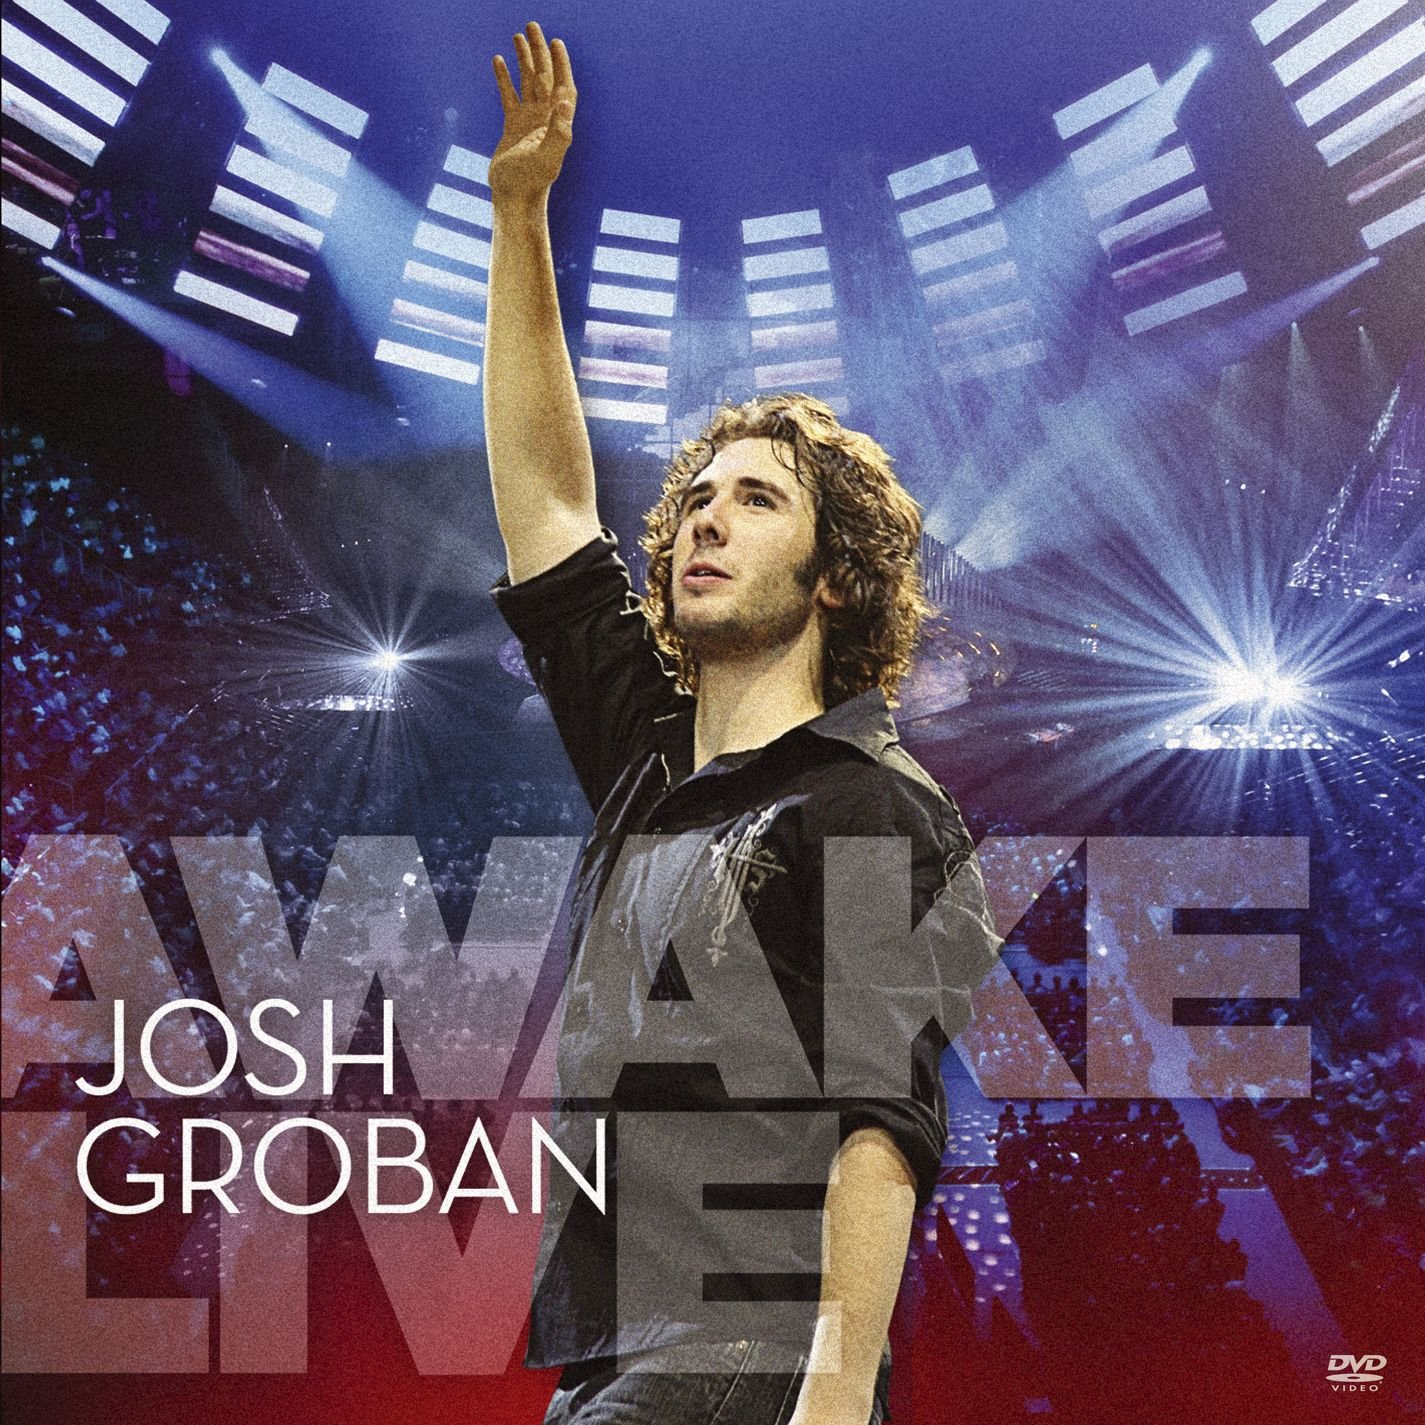 Josh Groban - Awake Live (CD/DVD) - Amazon.com Music